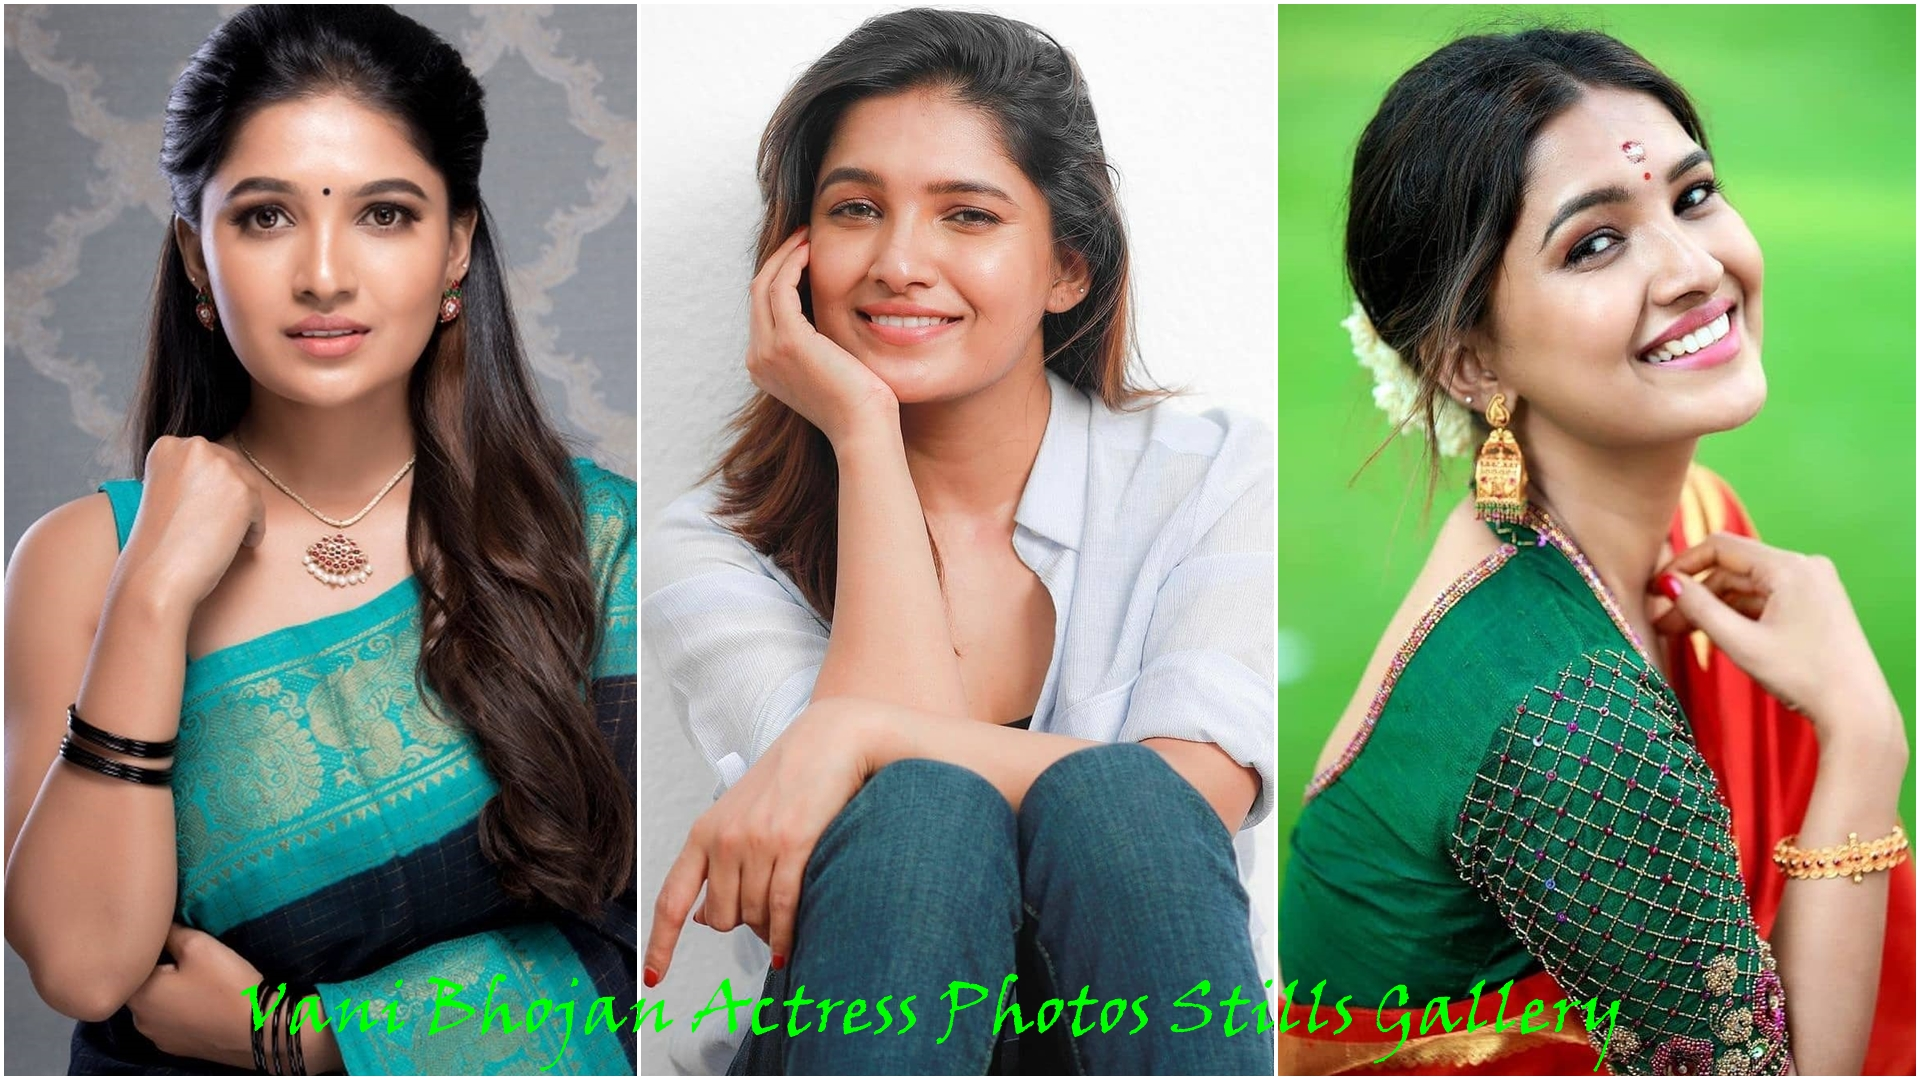 Vani Bhojan Actress Photos Stills Gallery (7)